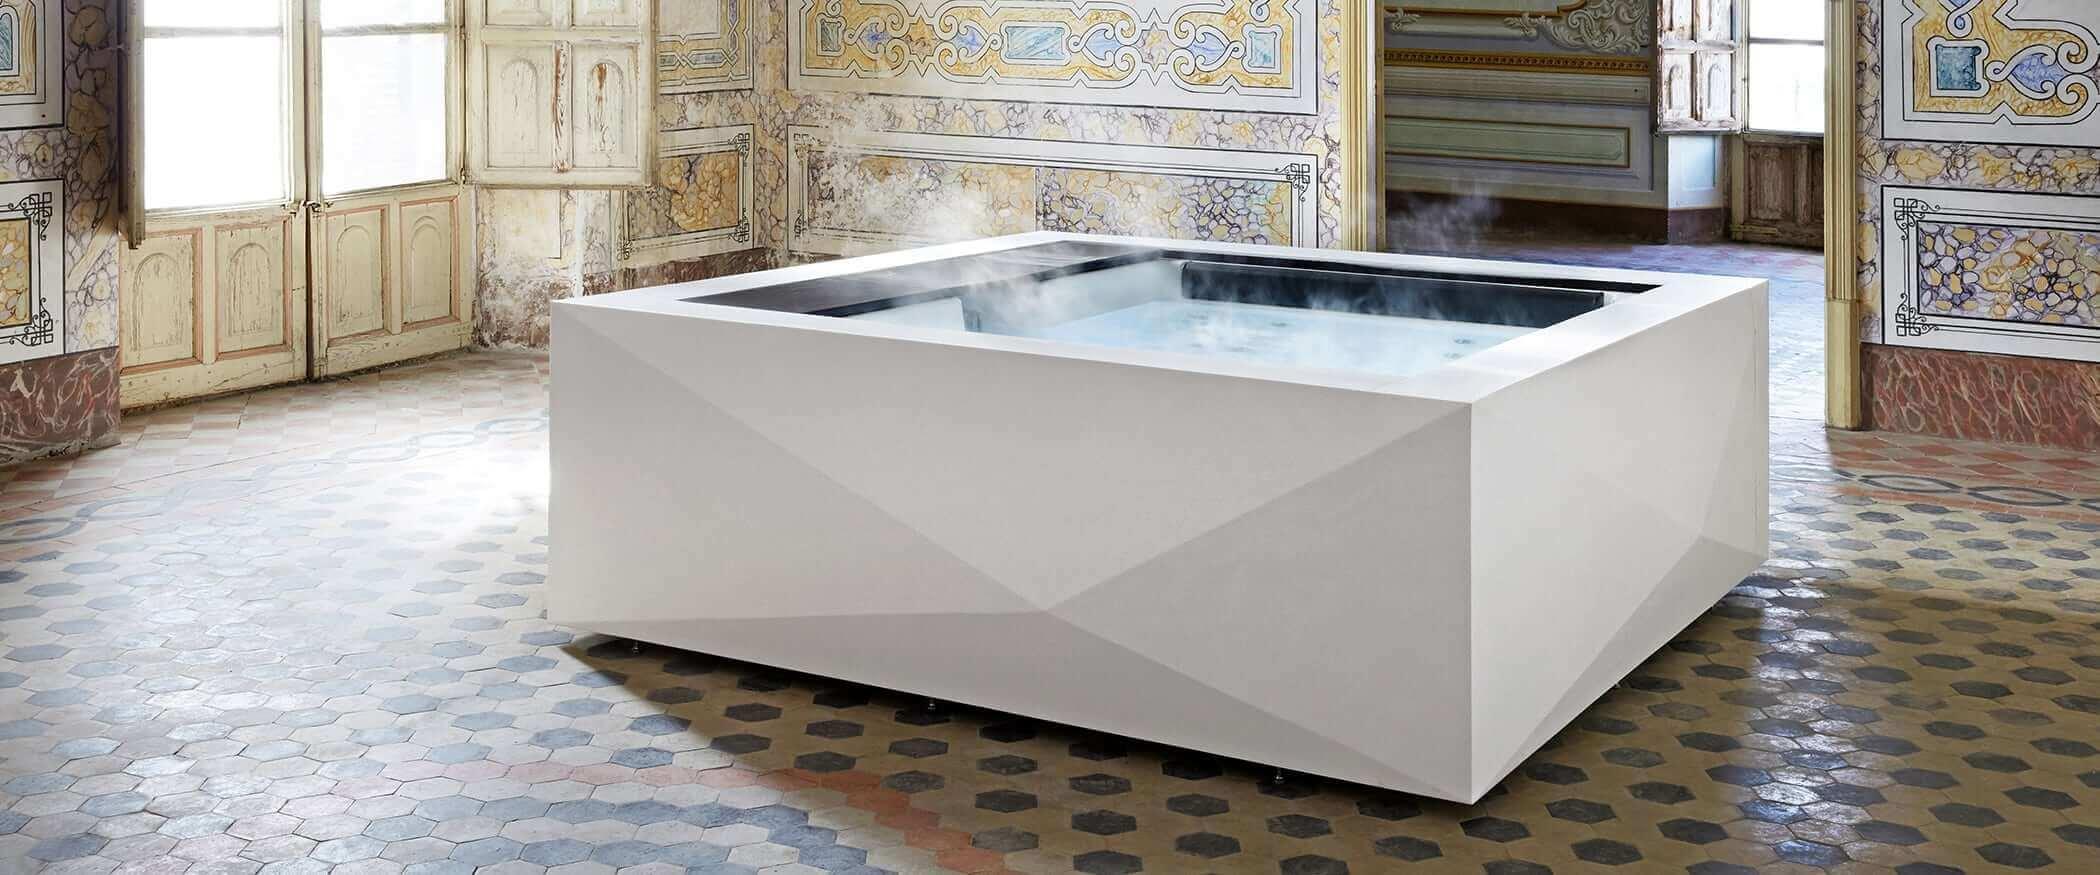 Origami Hot Tub